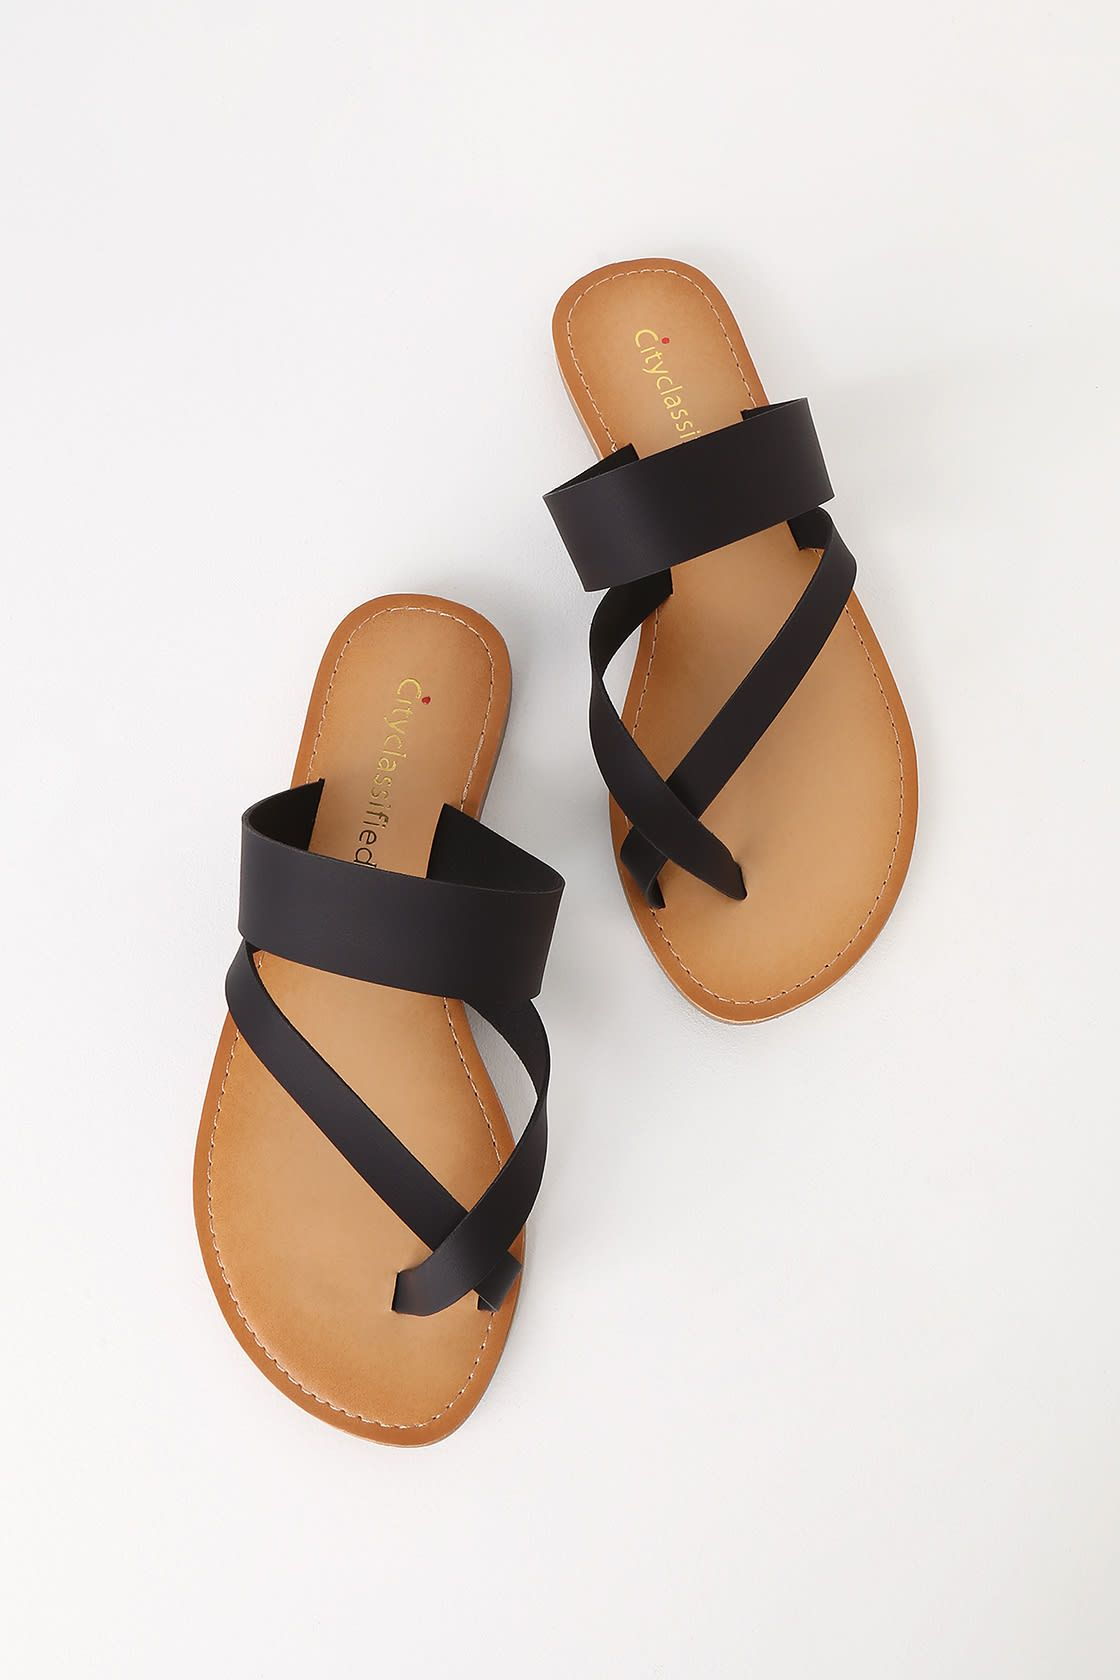 Oceanfront Black Flat Sandals   Black